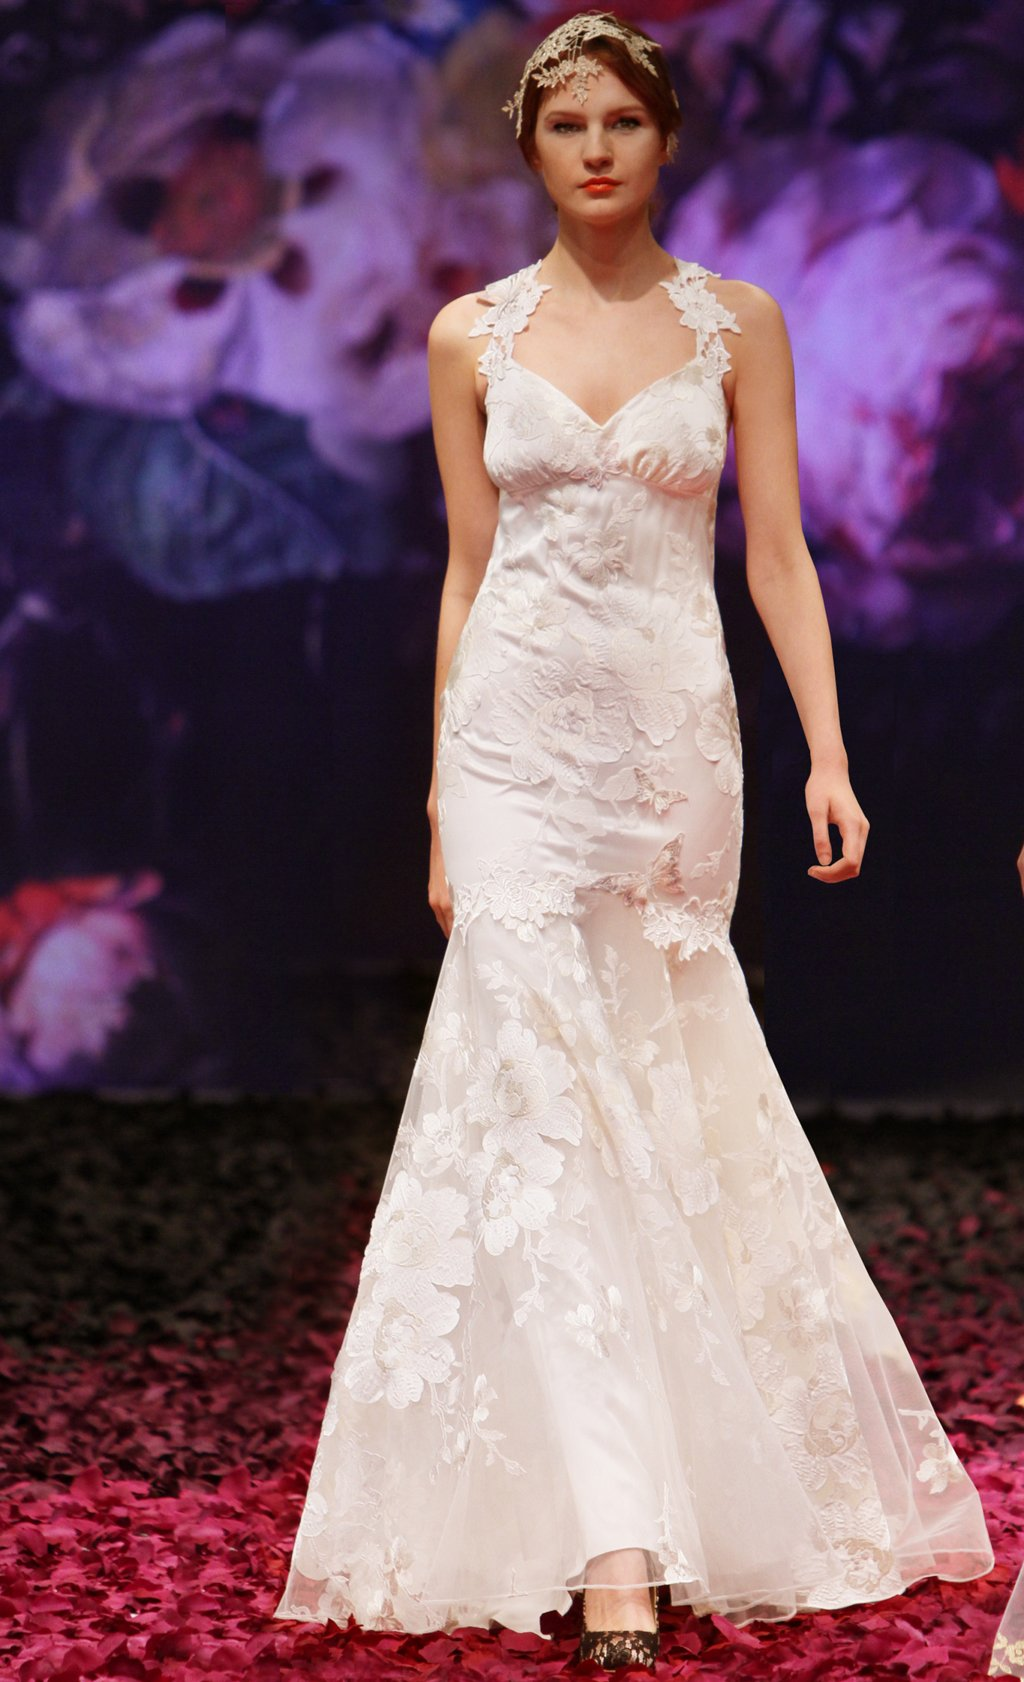 Mariposa-wedding-dress-by-claire-pettibone-2014-still-life-bridal-collection.full